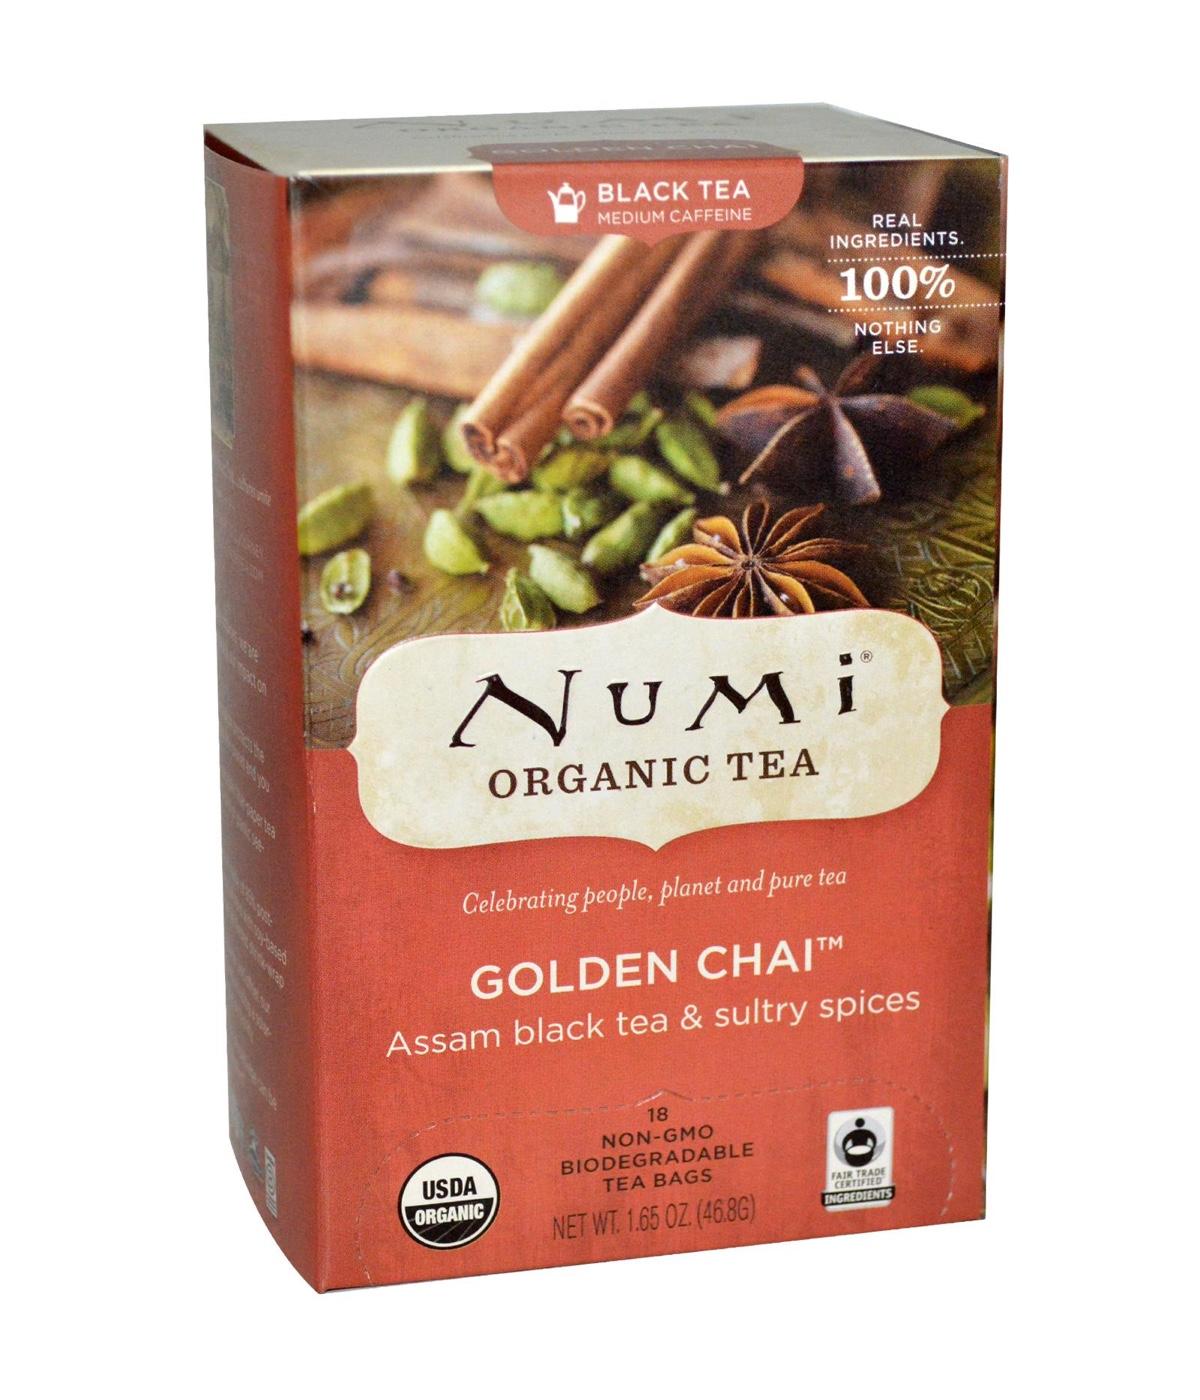 Numi Organic Tea Golden Chai - černý zlatý Chai, bio, 18 sáčků